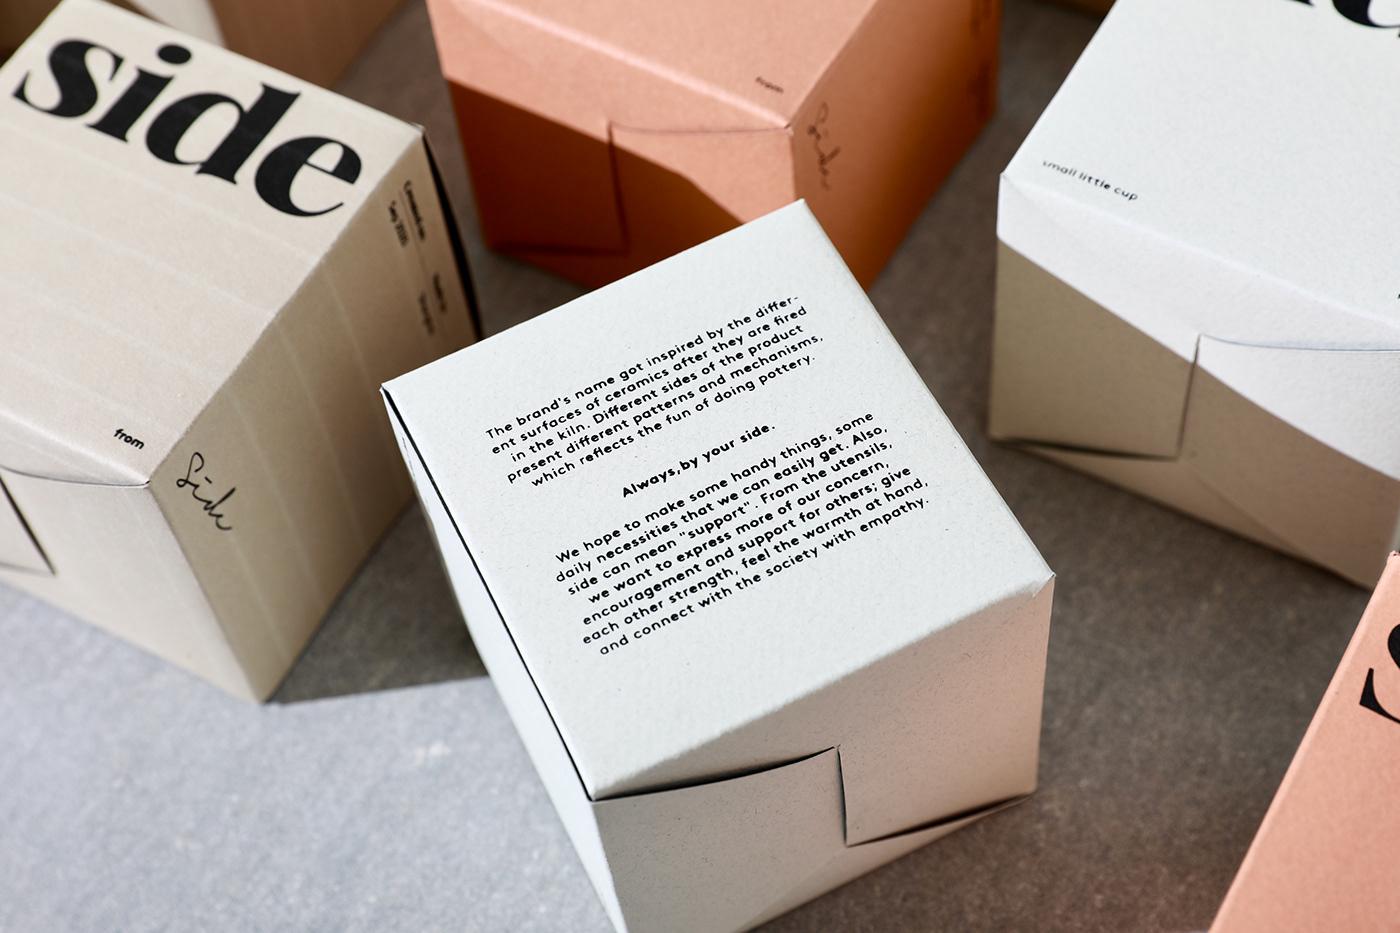 Image may contain: box, floor and carton